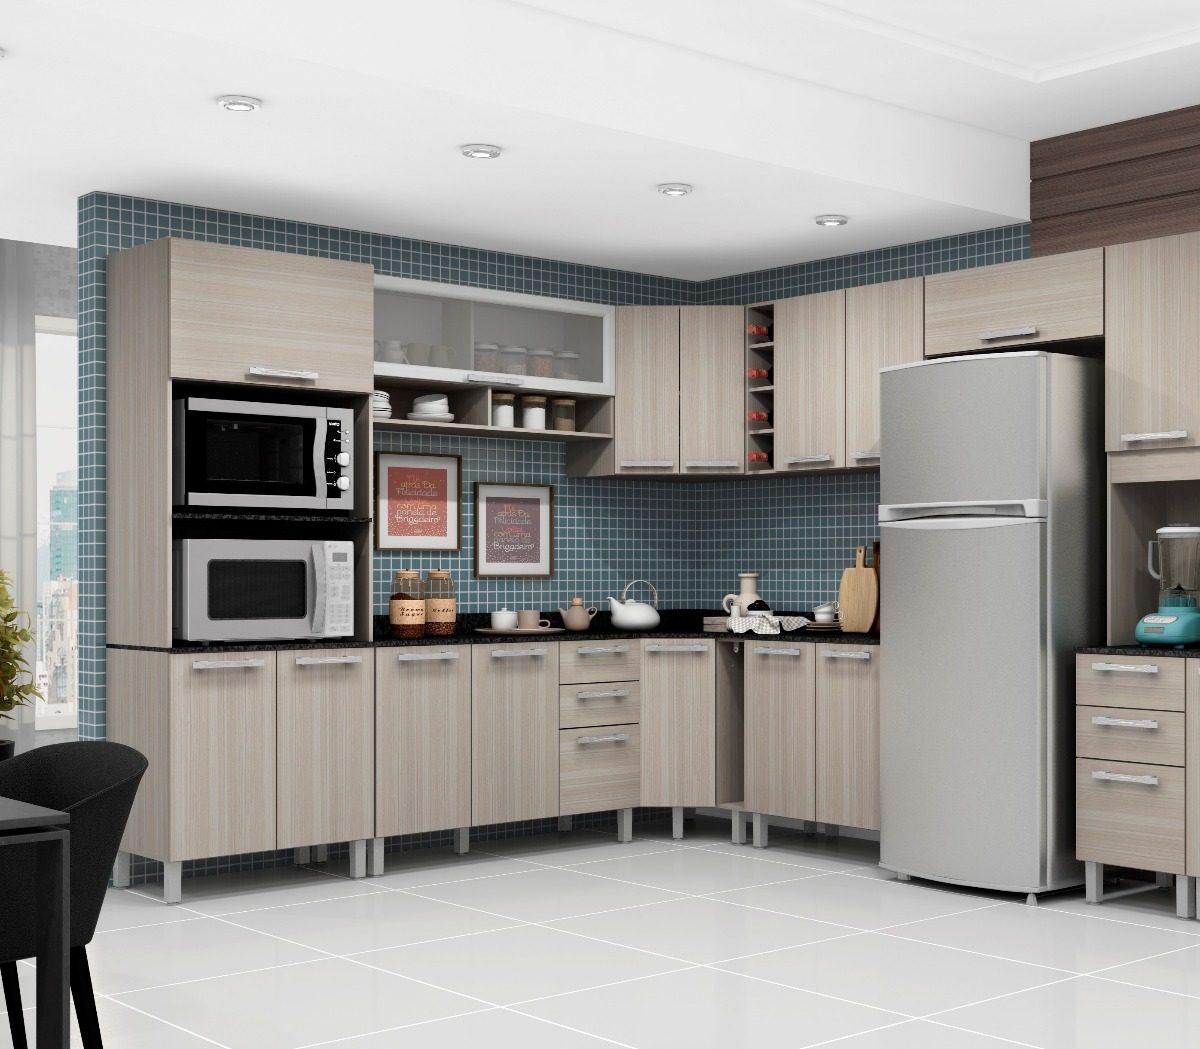 Jogo De Cozinha Completa Modulada 11 Pe As Rovere Poliman R